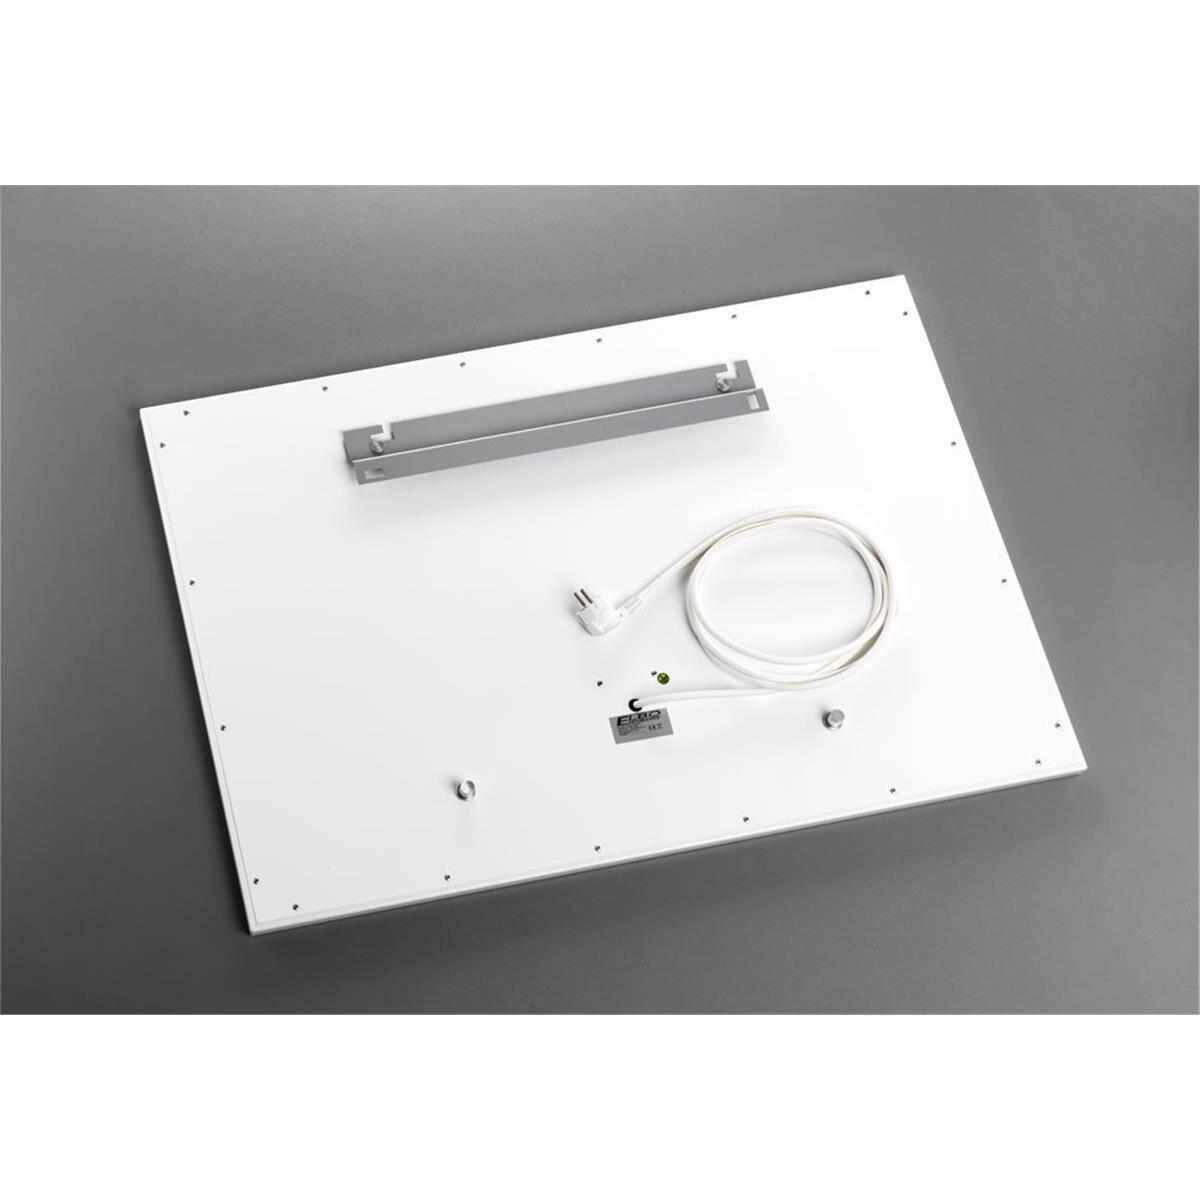 infrarotheizung elbo therm standard 600 watt 349 00. Black Bedroom Furniture Sets. Home Design Ideas